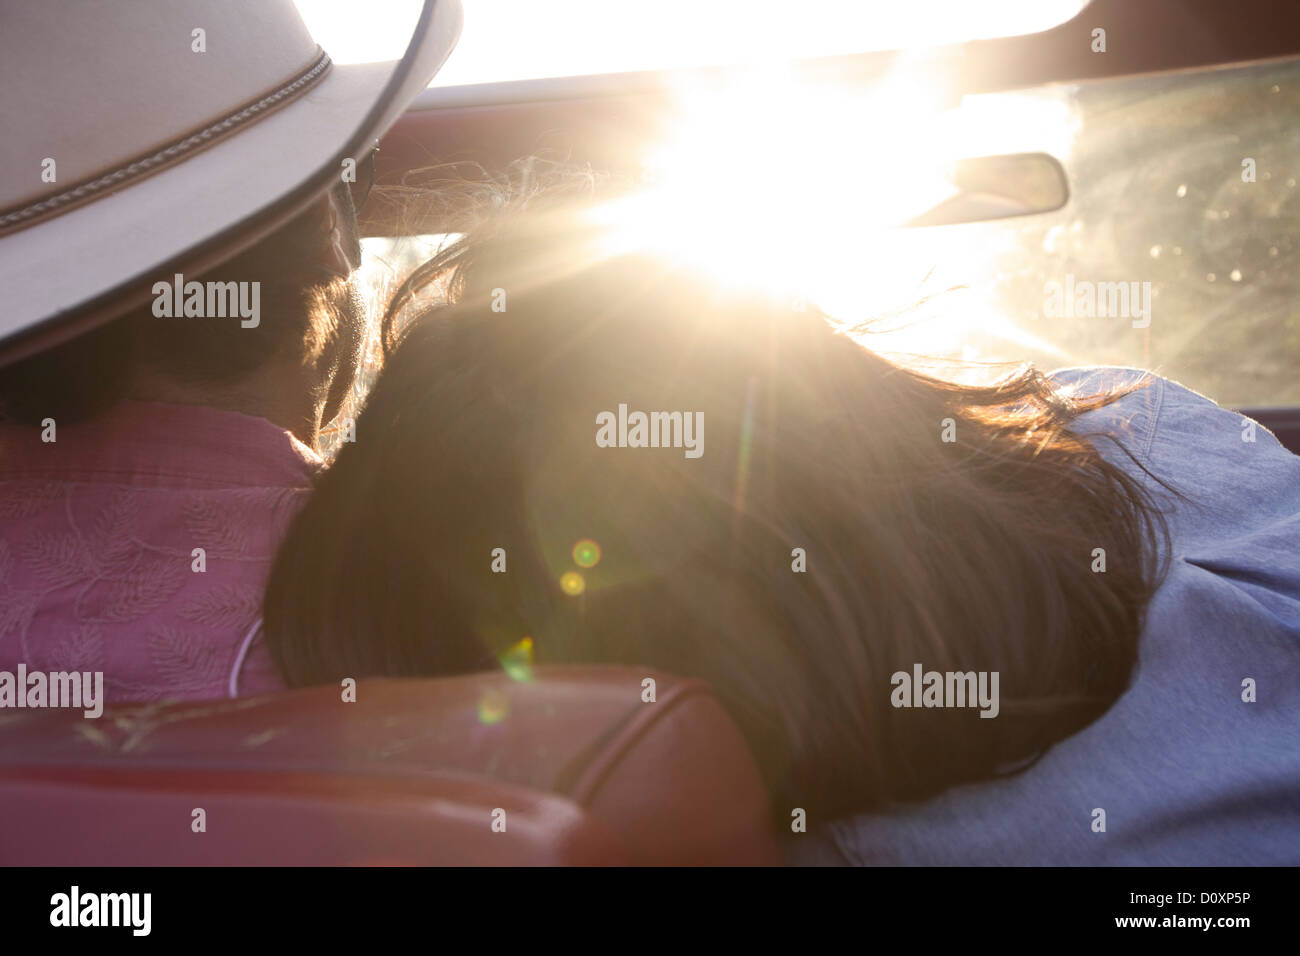 Woman resting head on boyfriend's shoulder as he drives in sunlight - Stock Image